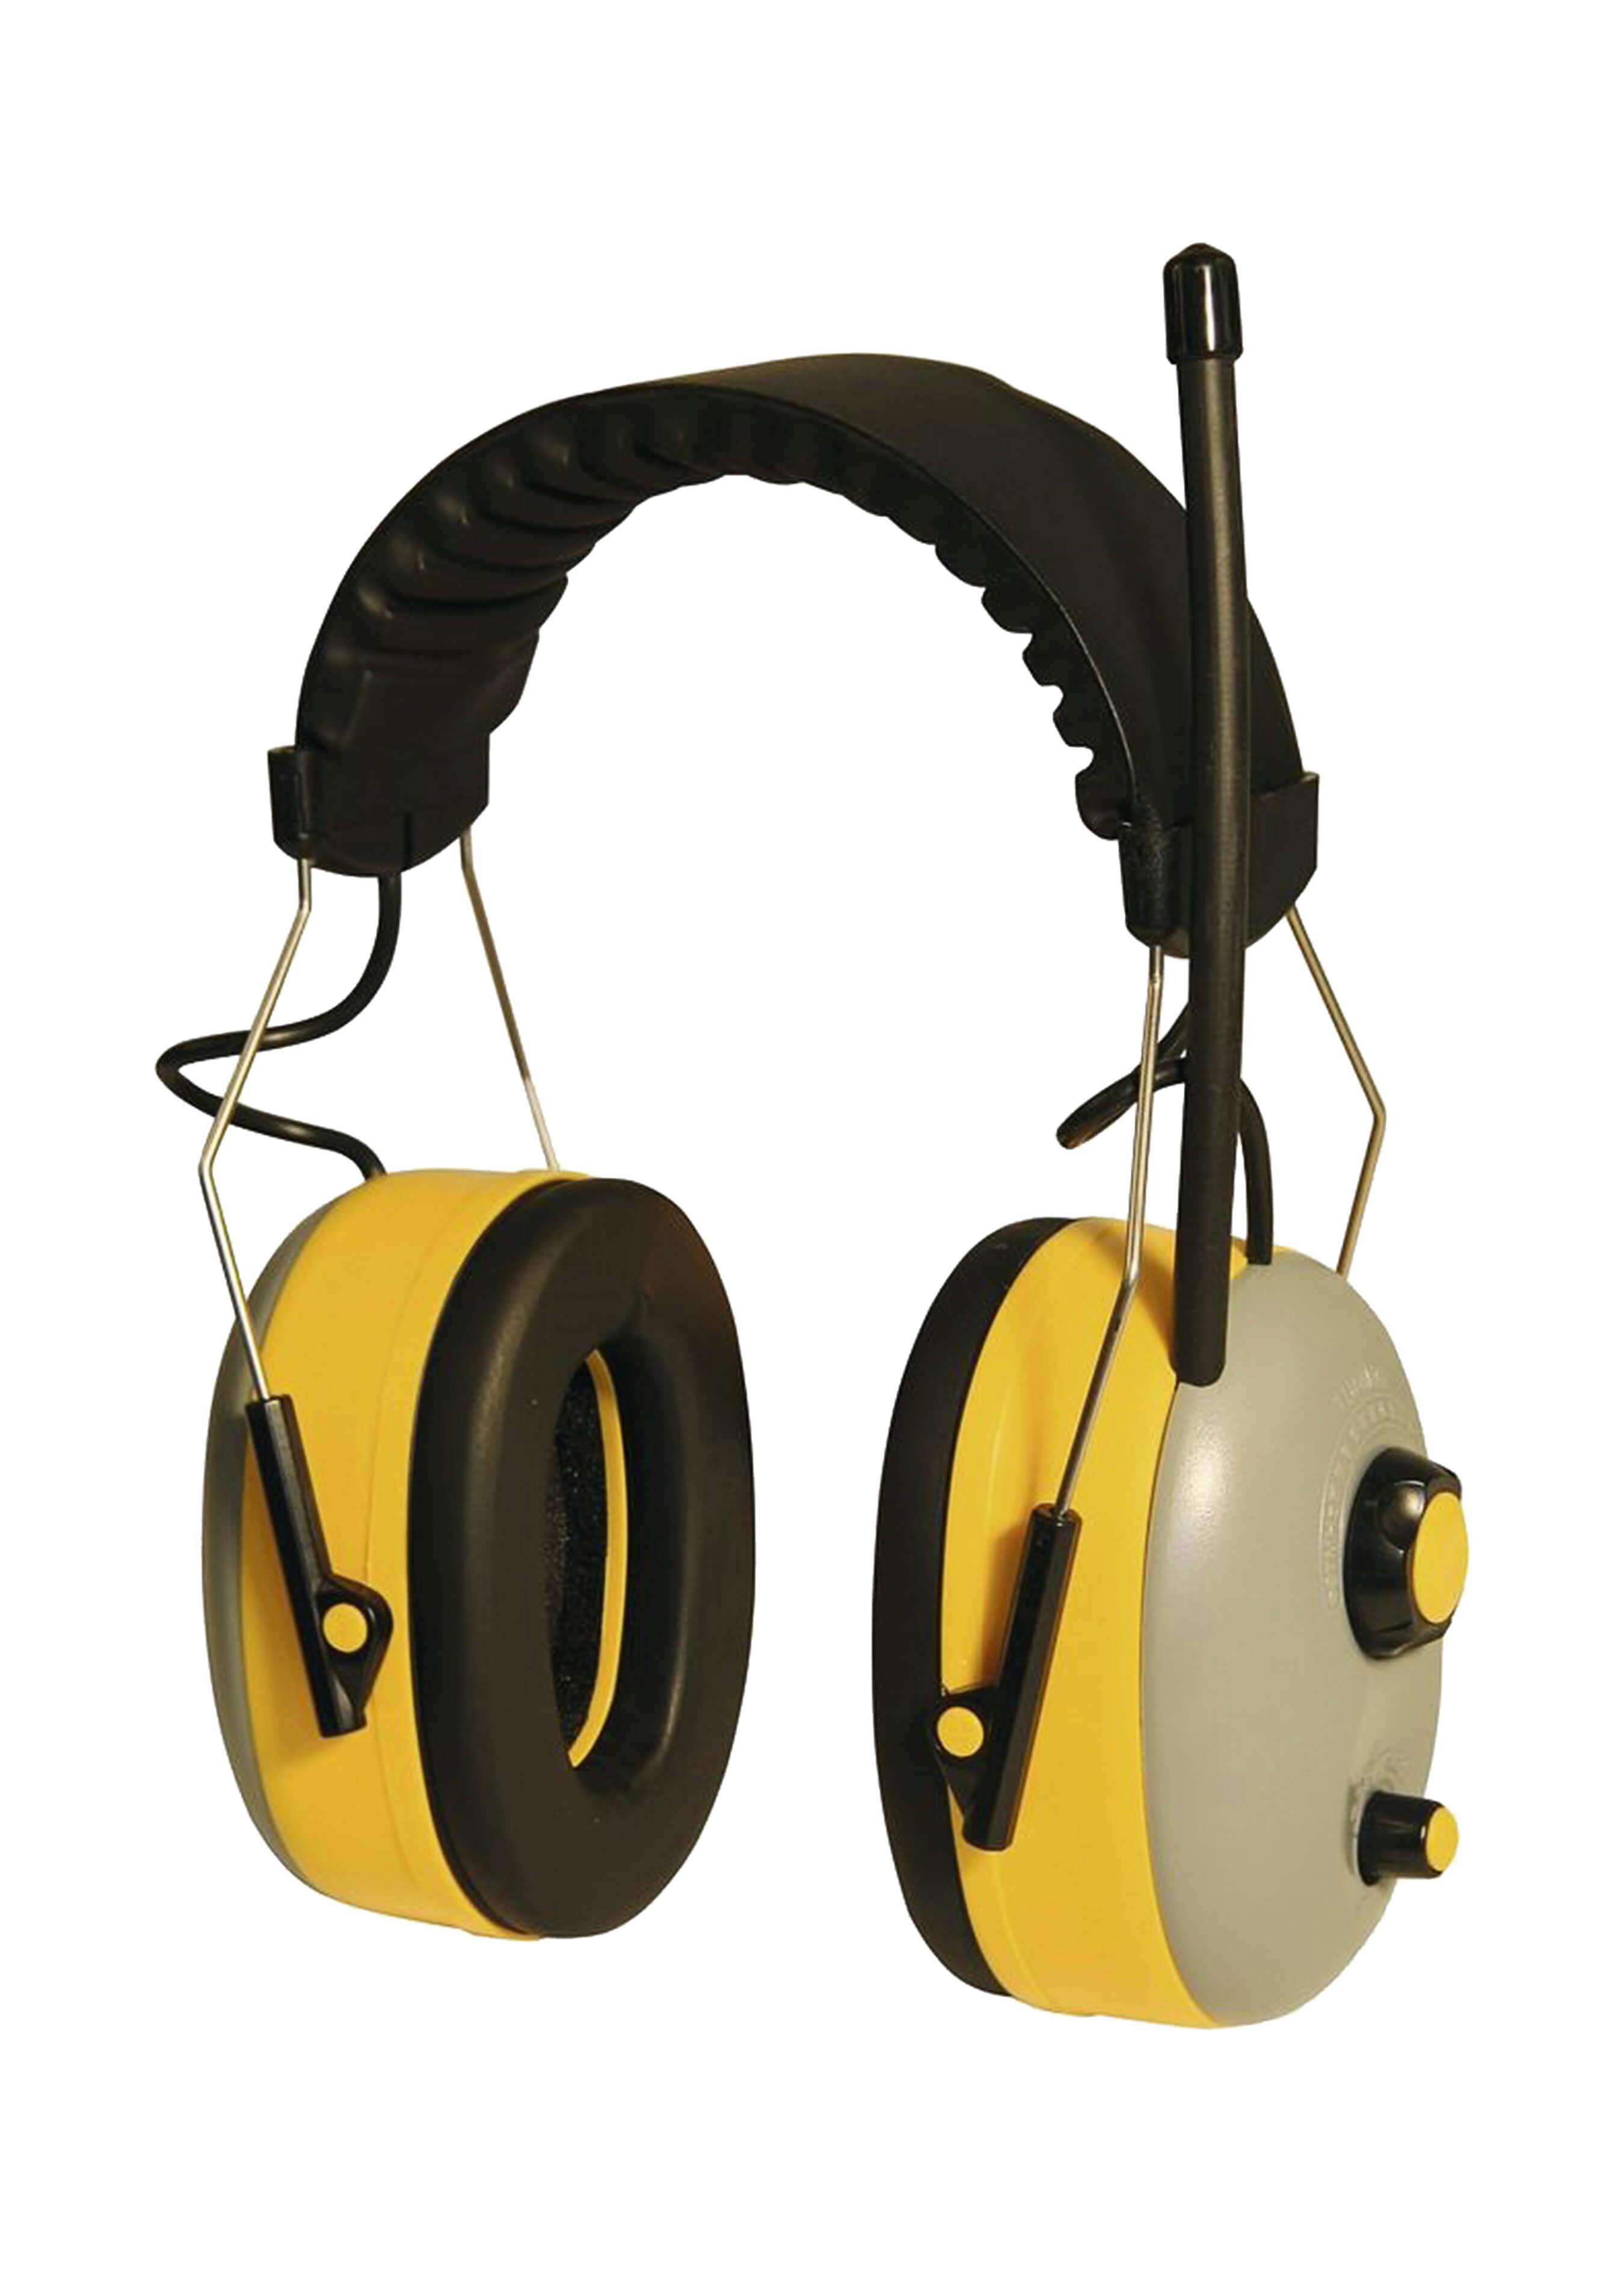 Gehörschutz mit Stereo-Radio 275001 1